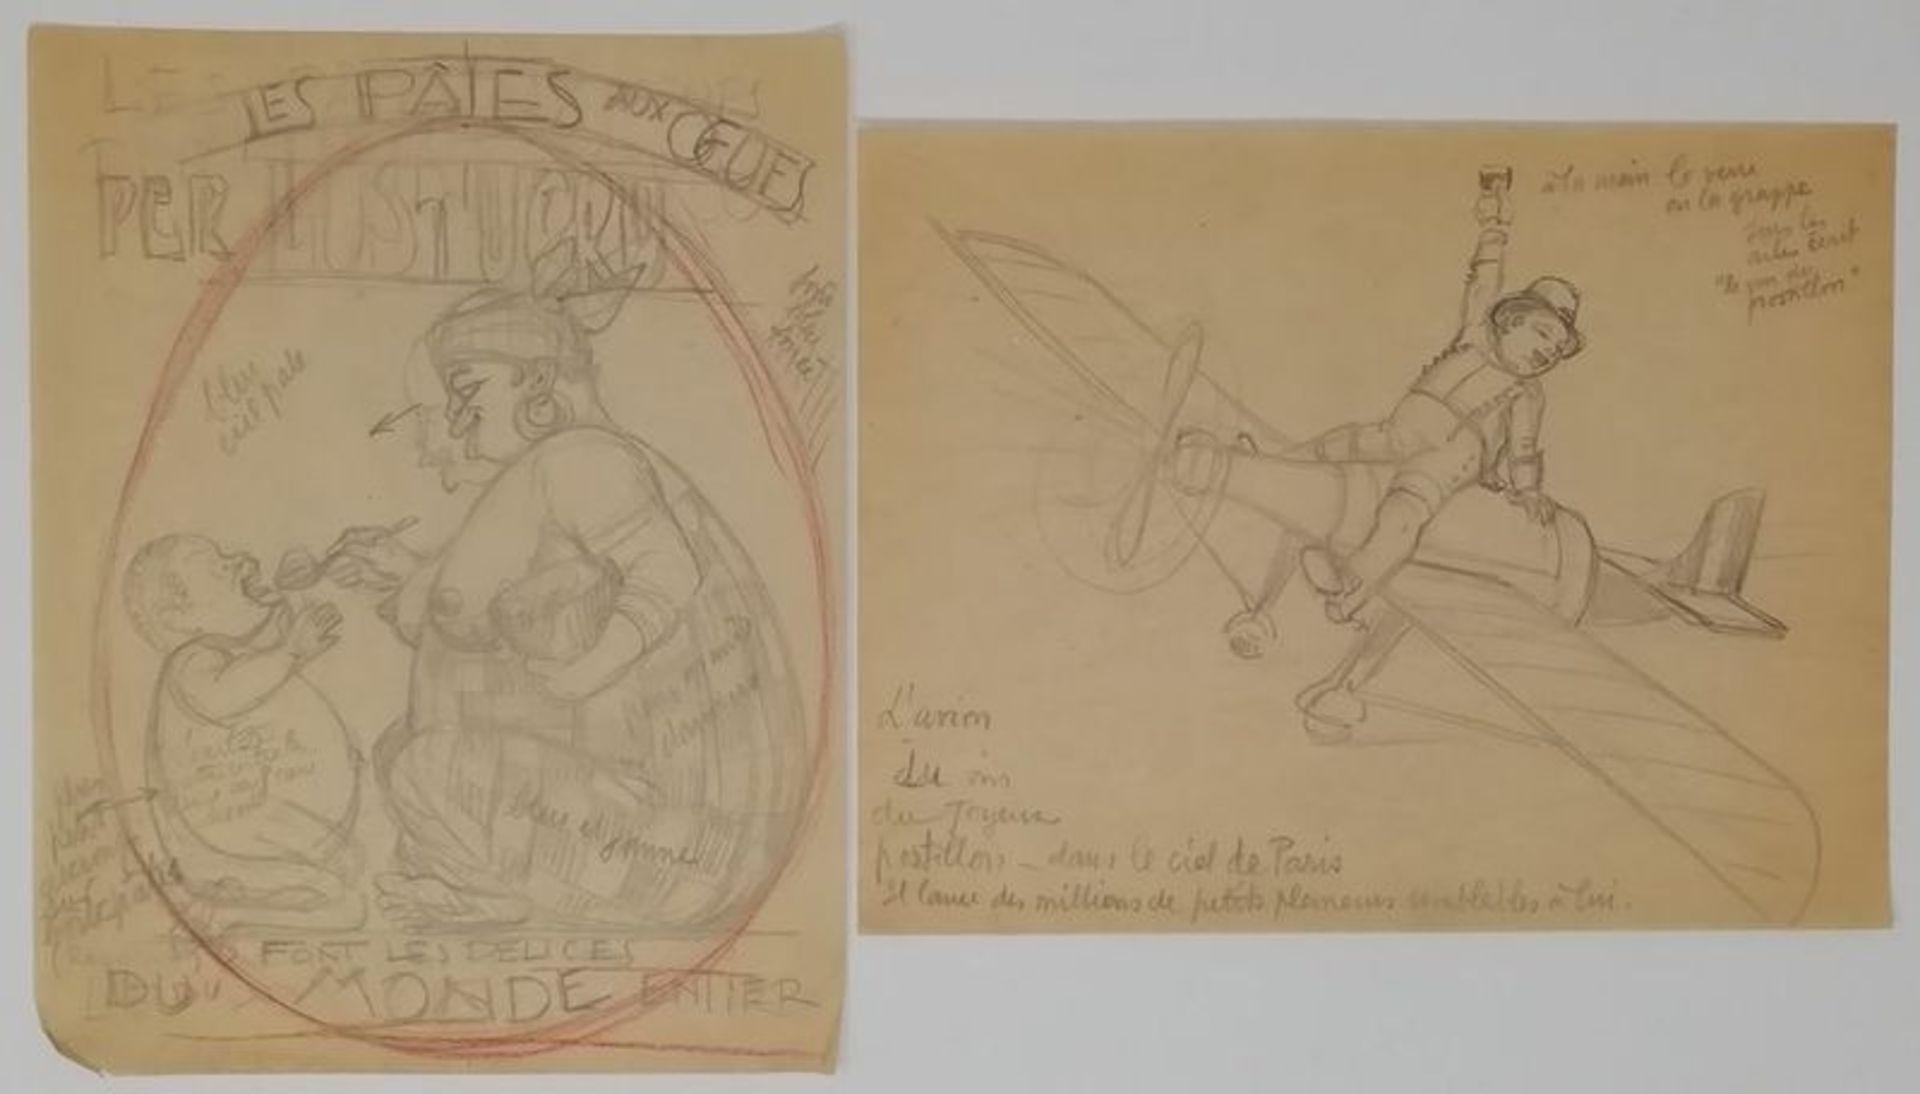 Charles-Léonce Brossé (1871 - ?) Advertising projects, menus, original drawings [...] - Bild 4 aus 4